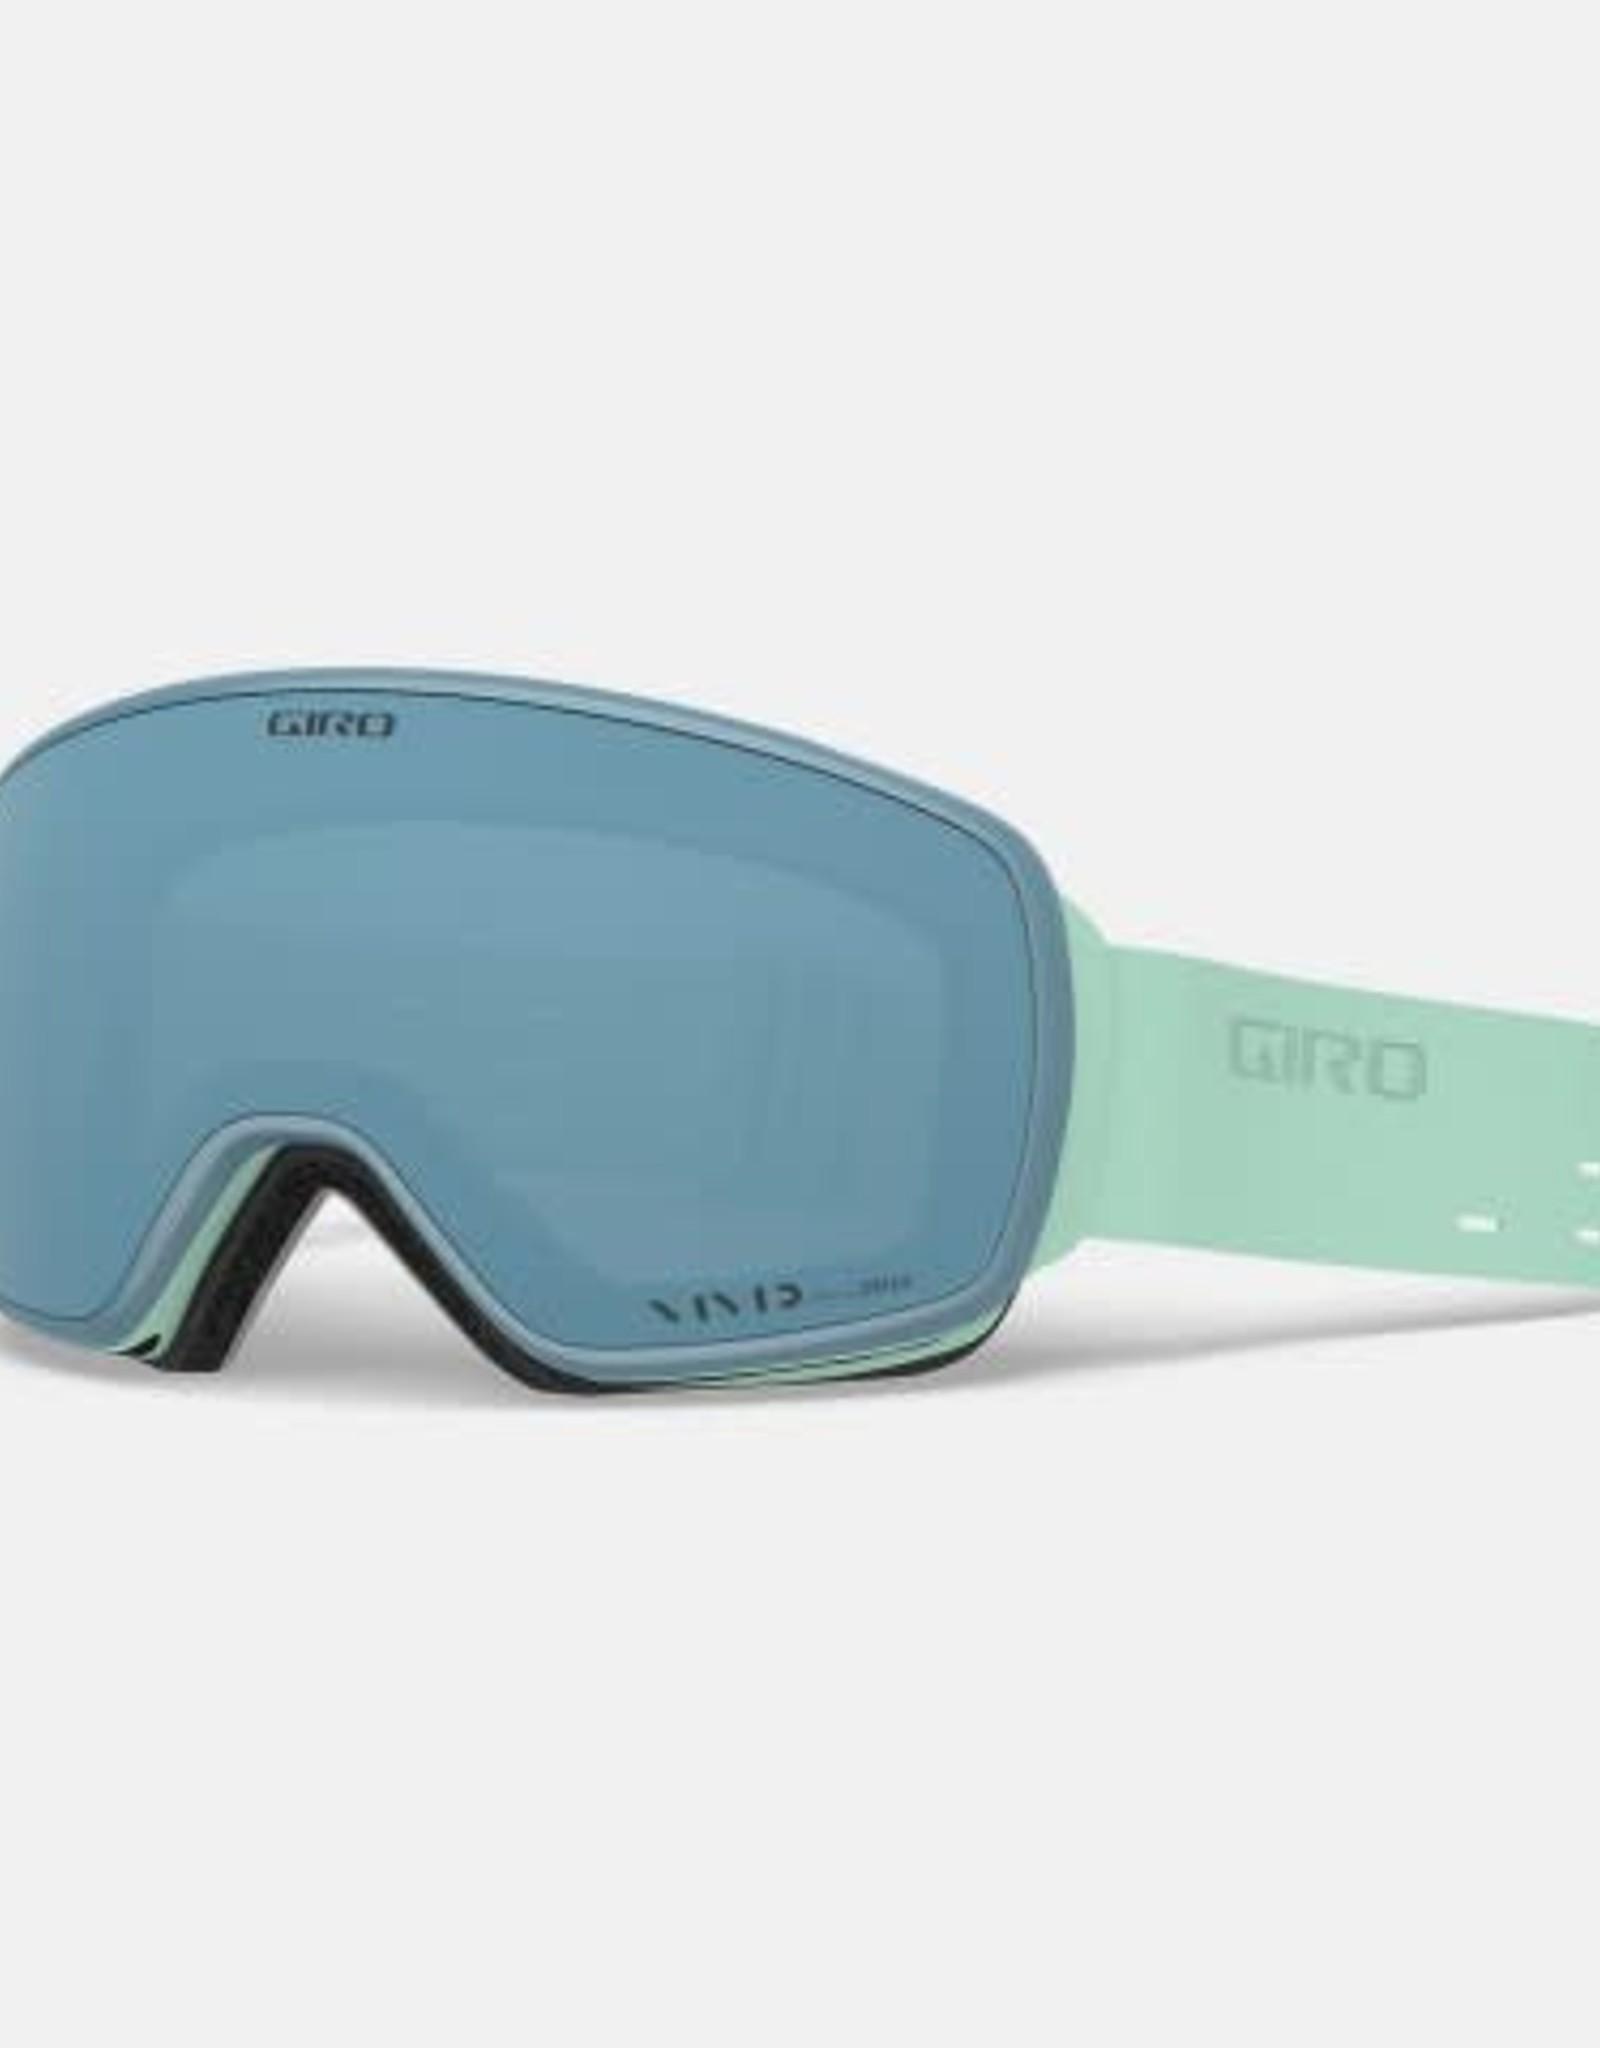 Giro Eave Goggle + Bonus Lens